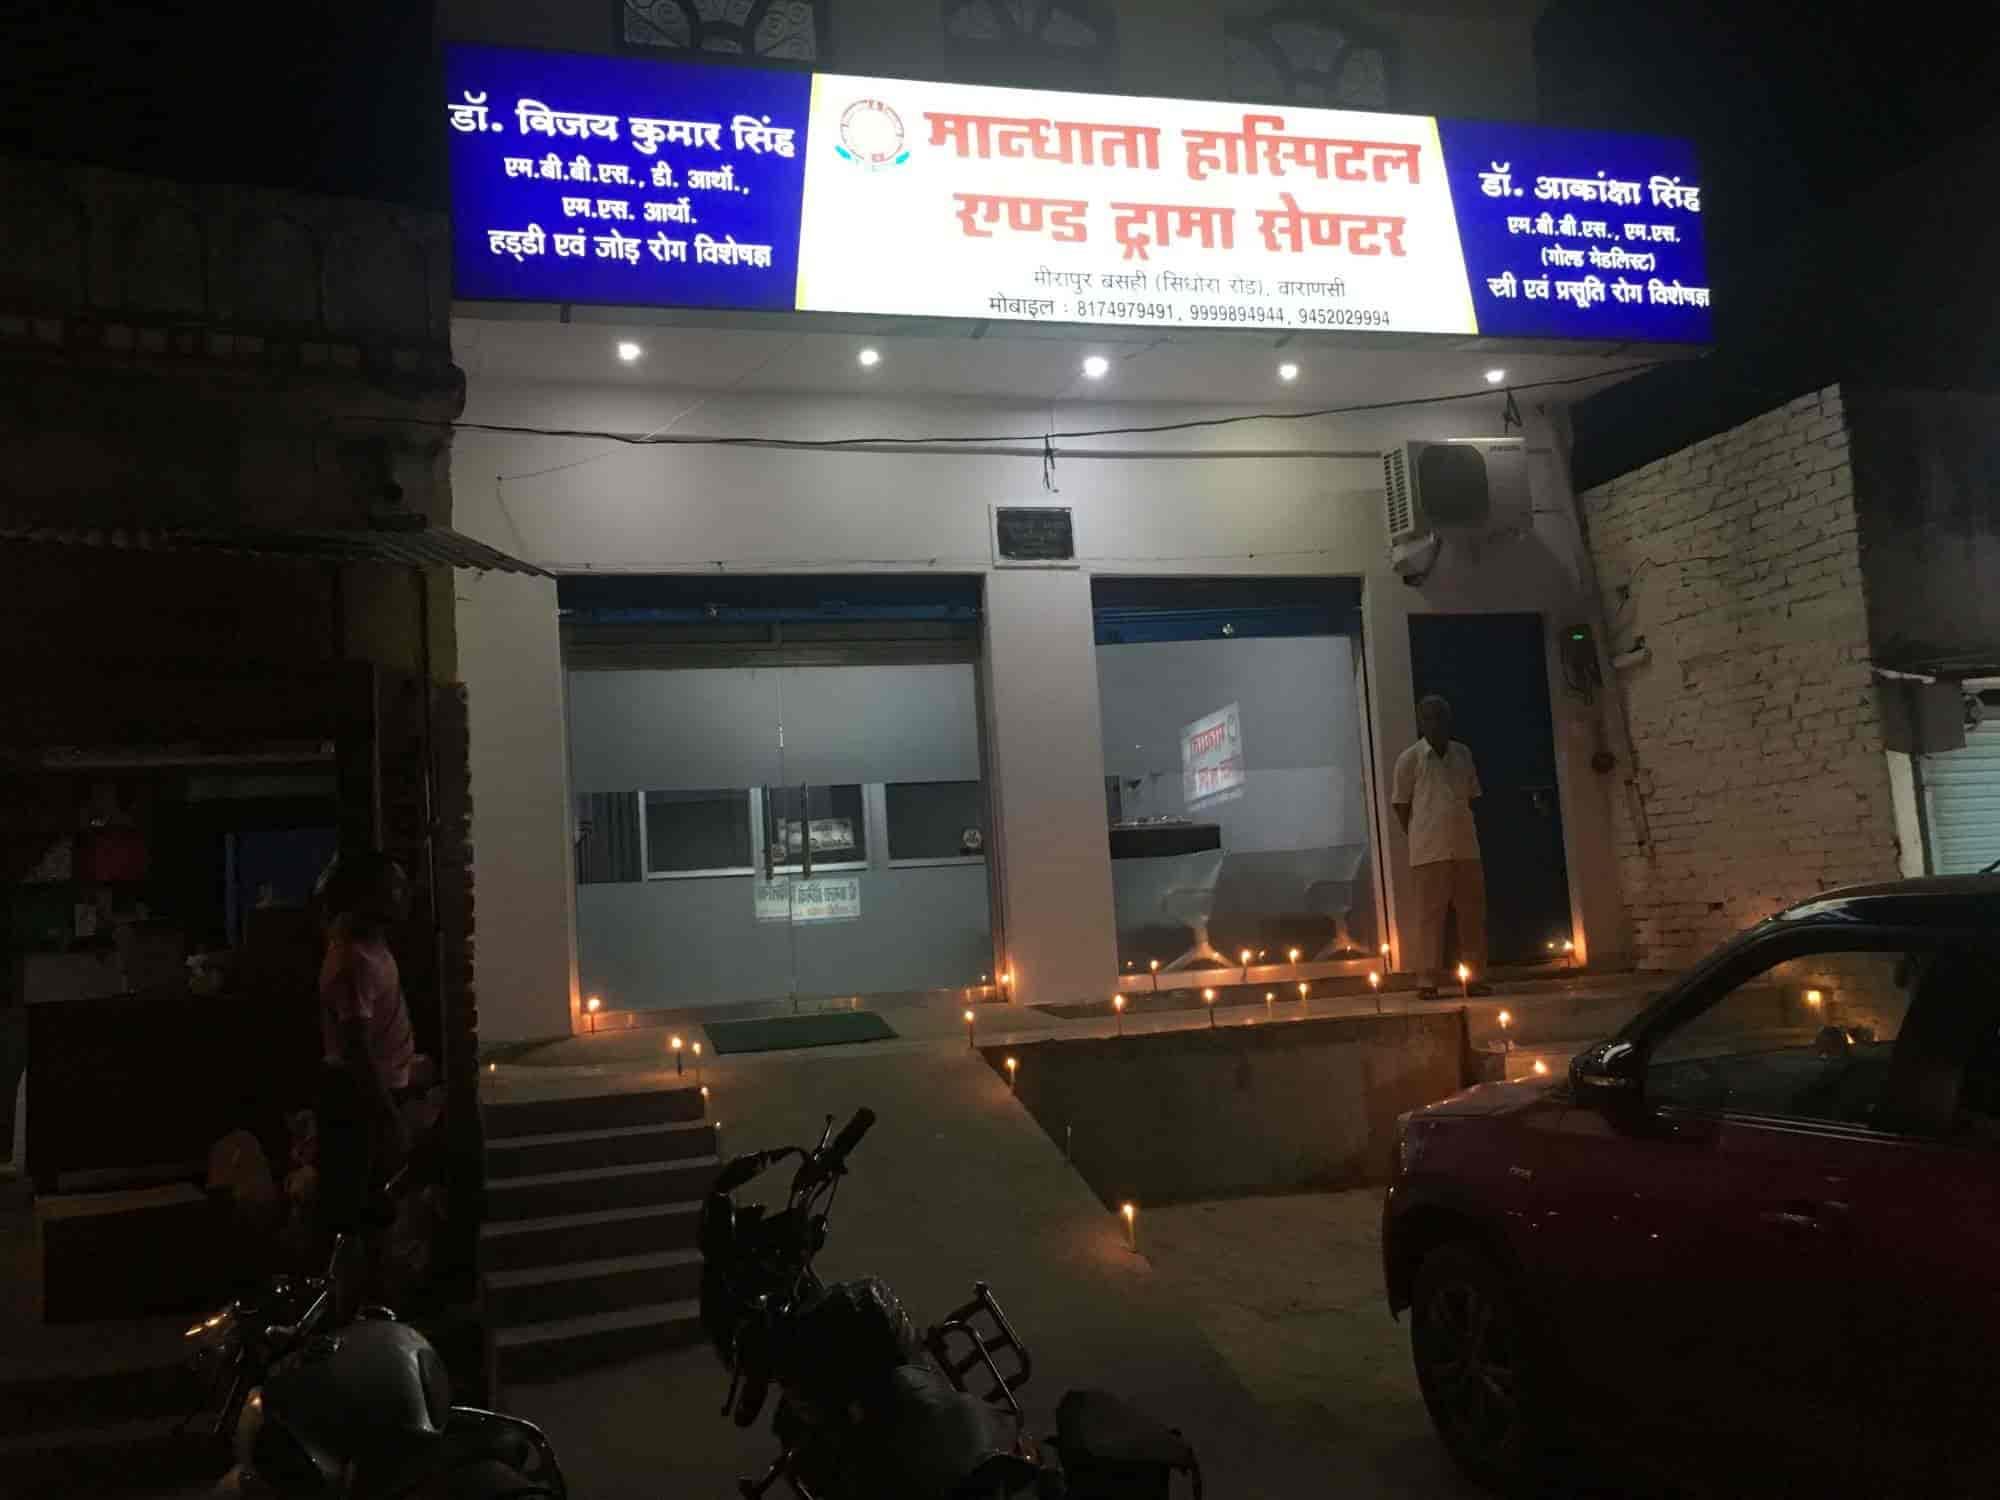 Mandhata Hospital And Trauma Centre Orderly Bazar Hospitals In